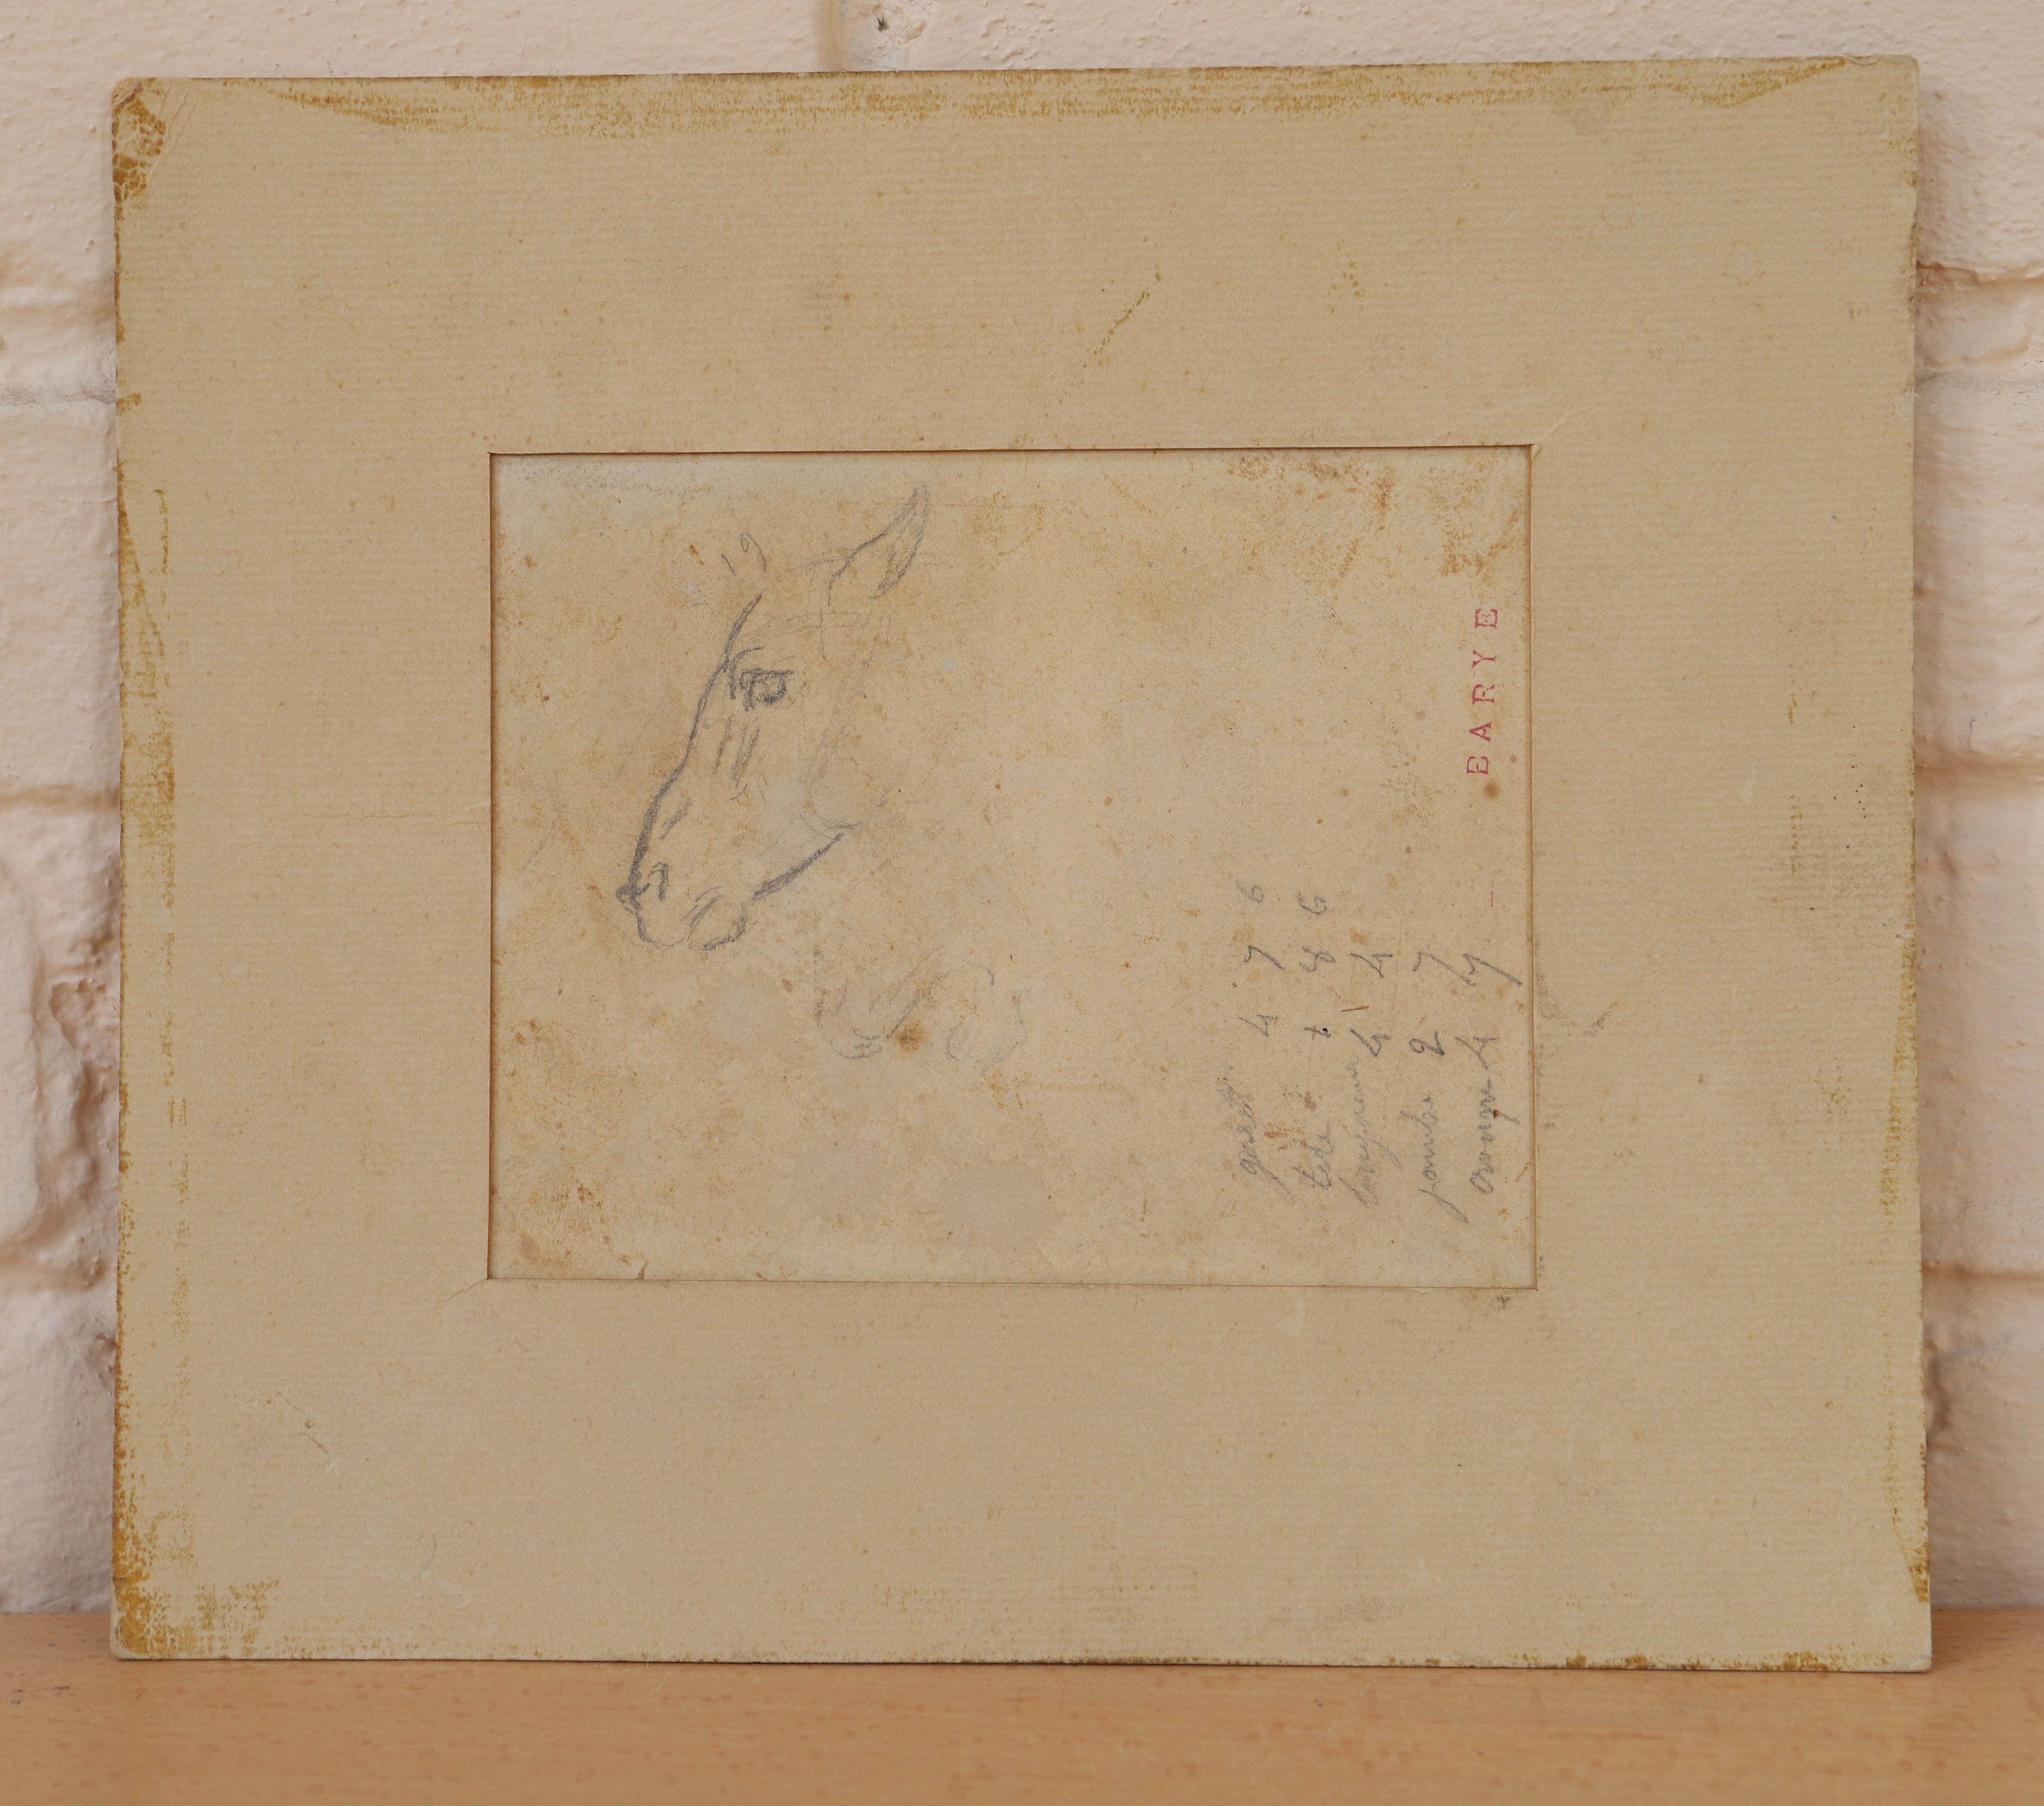 "Los 14 - DESSIN ""ETUDE DE TETE DE CHEVAL"" DE BARYE Crayon sur papier, annoté, portant le [...]"